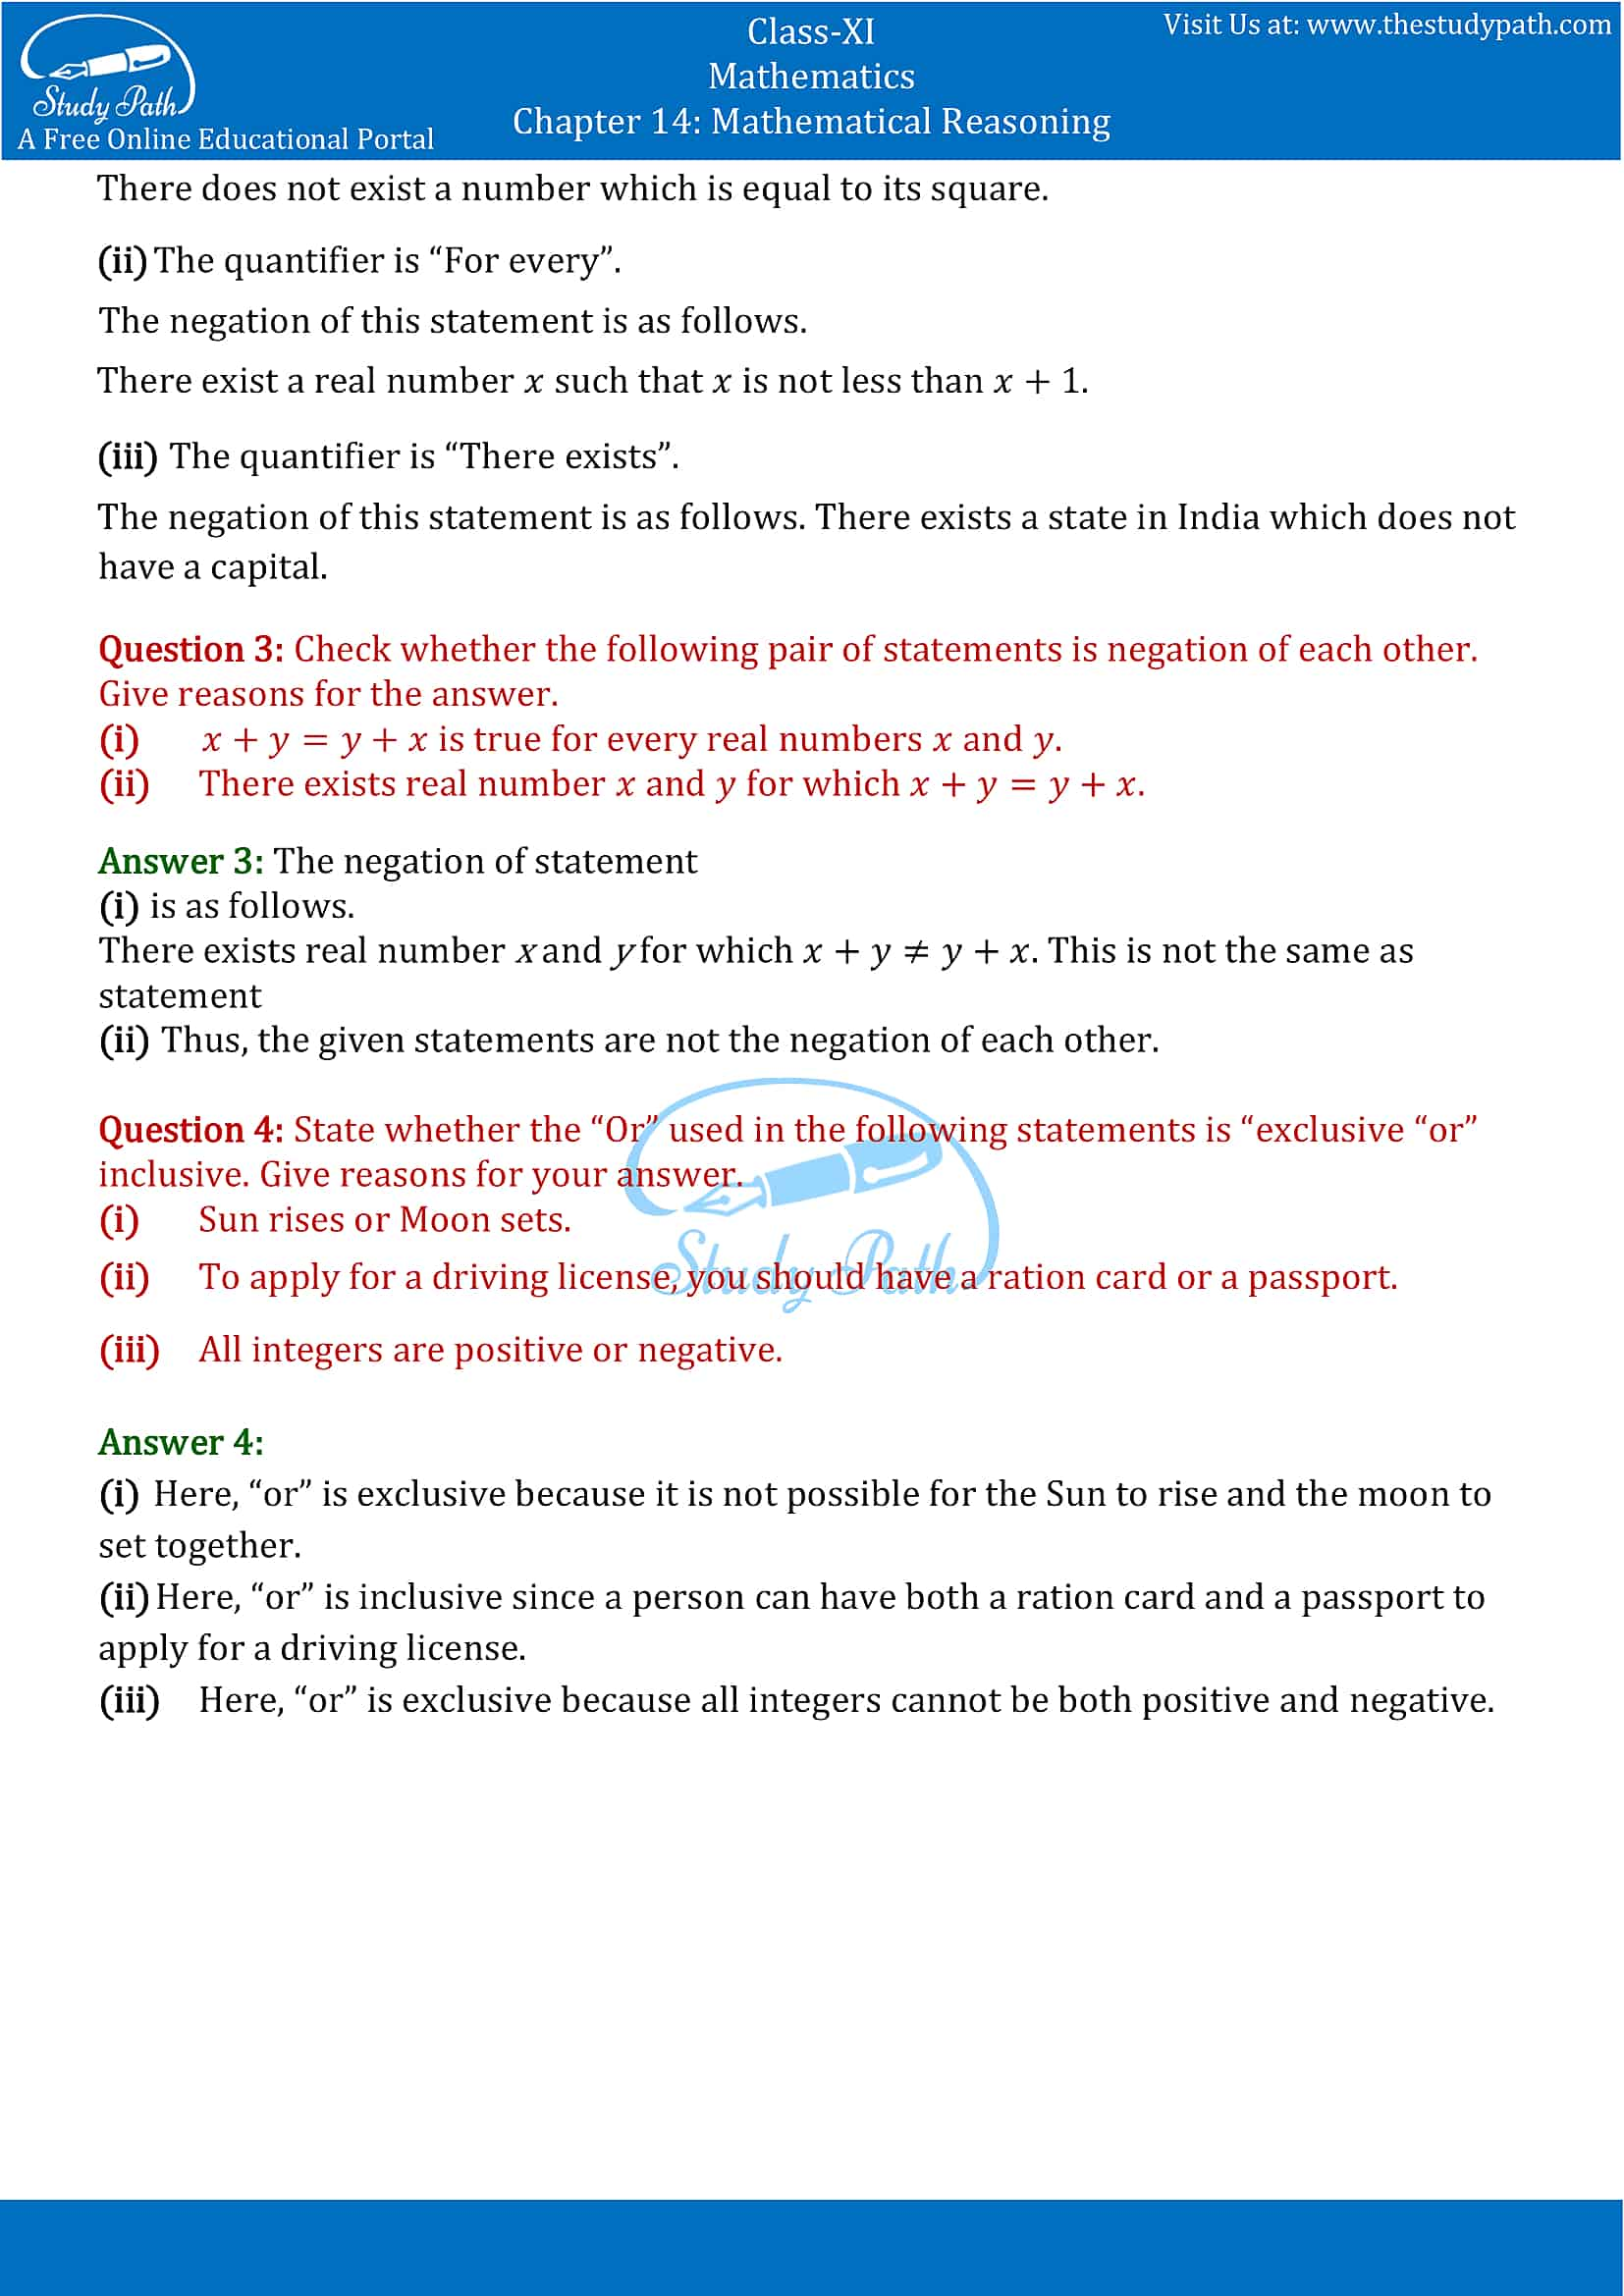 NCERT Solutions for Class 11 Maths Chapter 14 Mathematical Reasoning Part 6